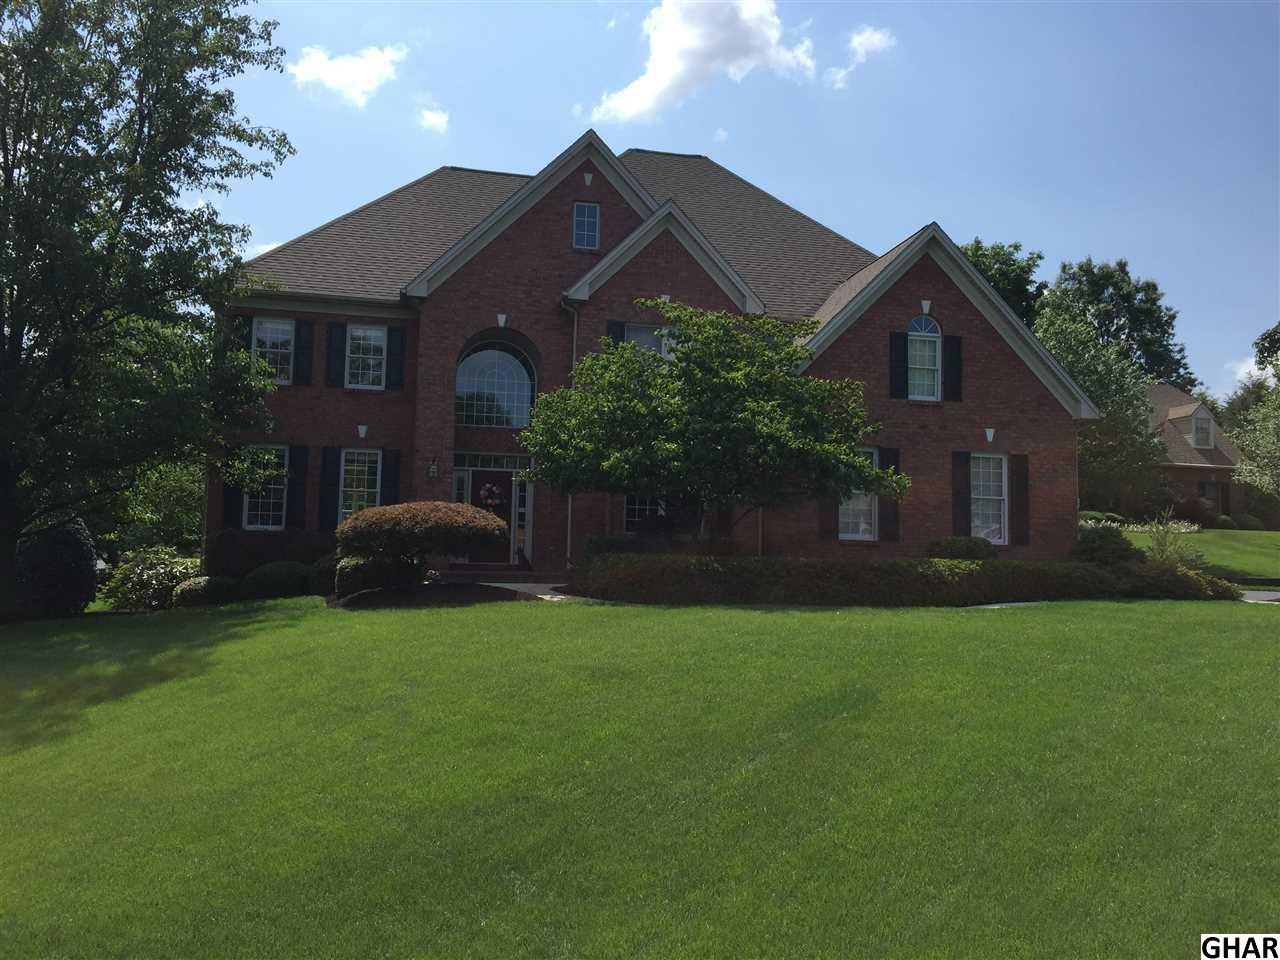 Real Estate for Sale, ListingId: 32856305, Camp Hill,PA17011